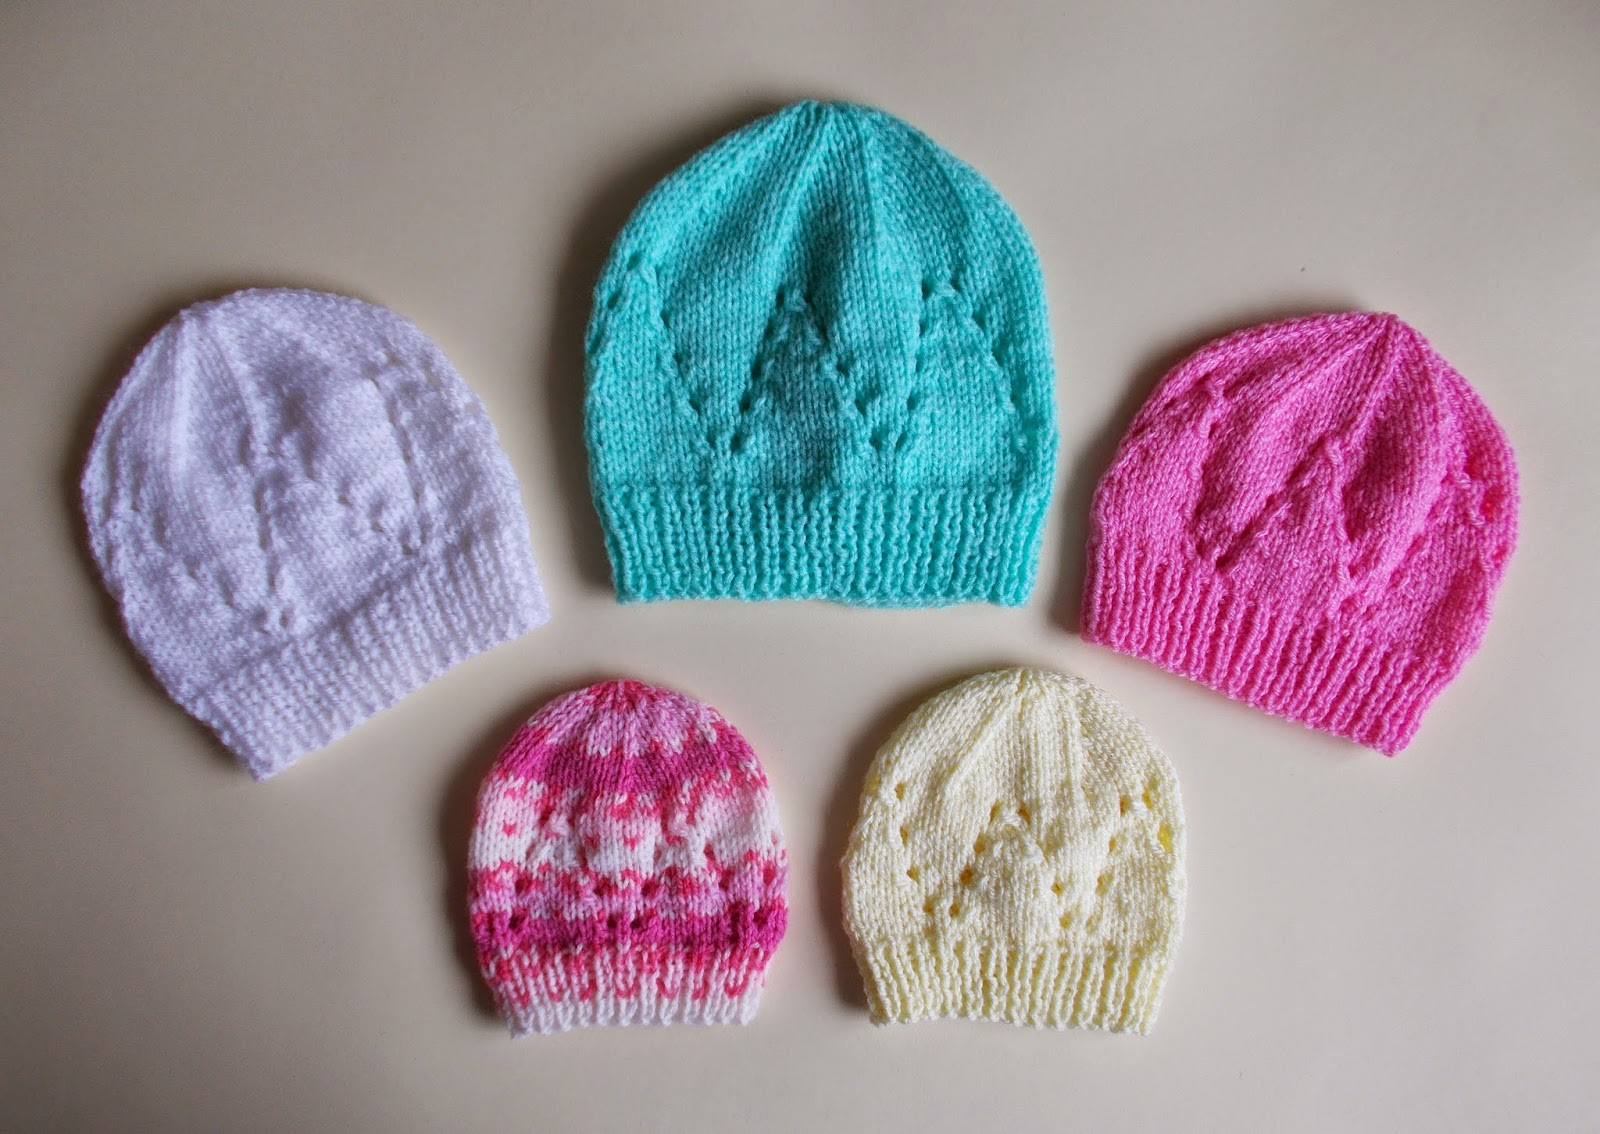 made-by-marianna: My Free Knitting Patterns